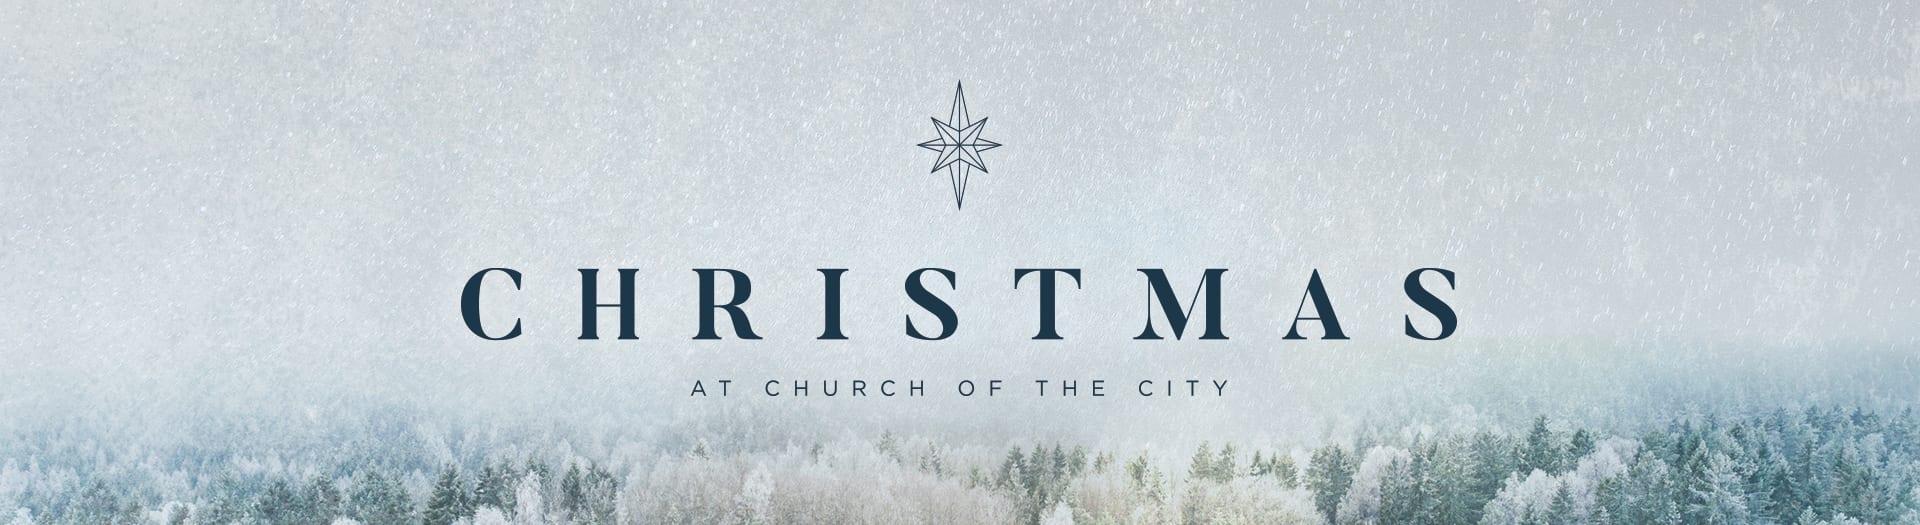 Church of the City | Christmas